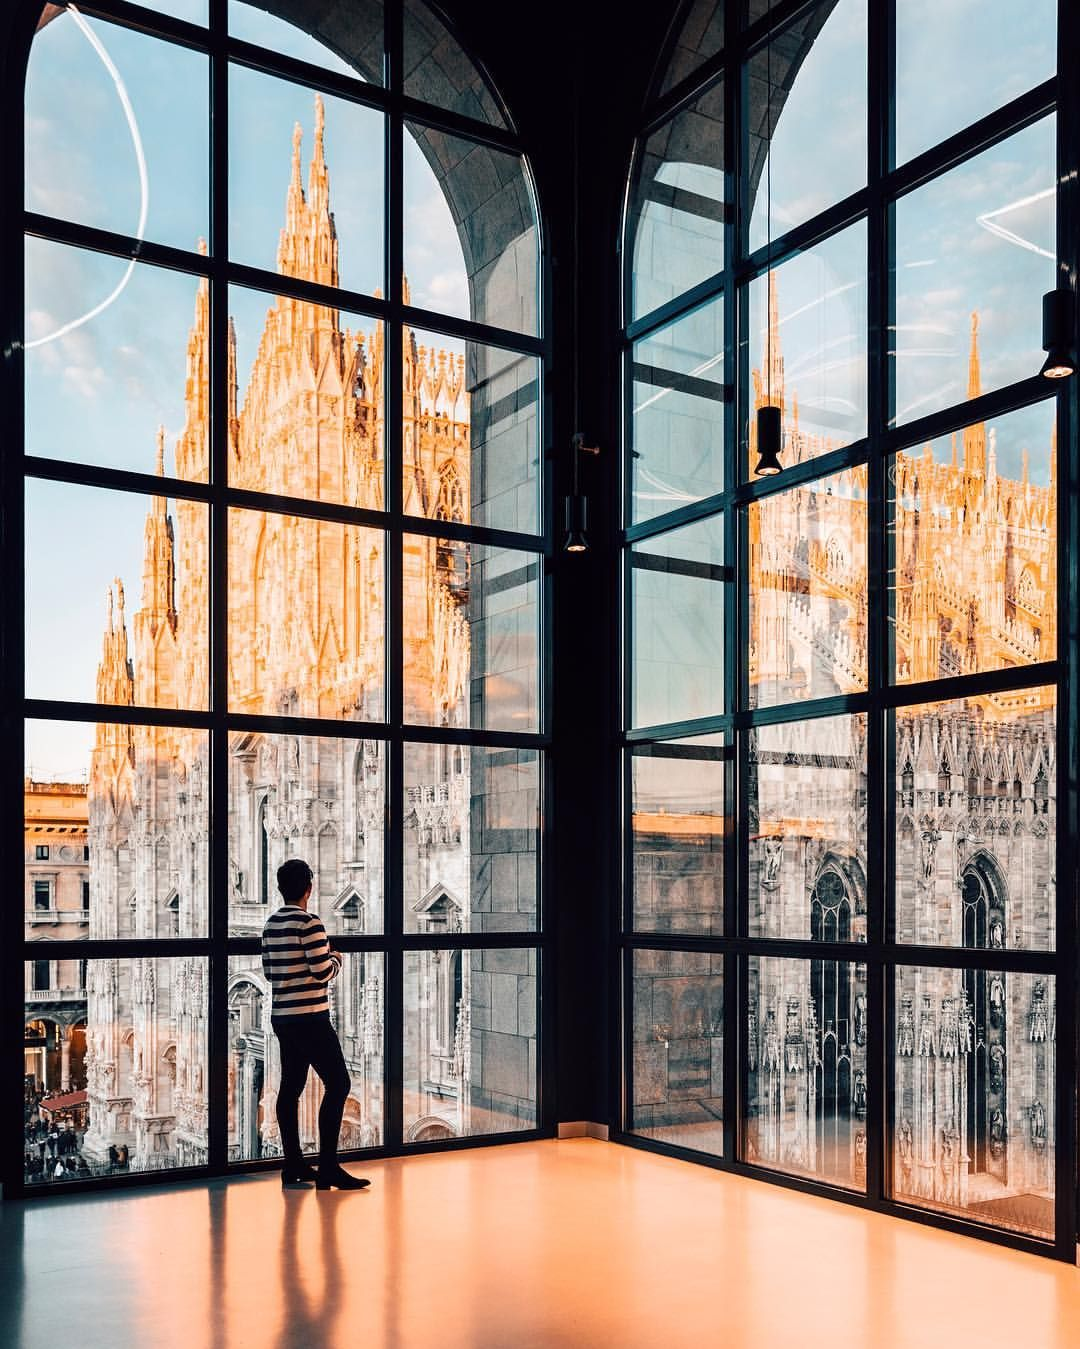 Museo Del 900 Milano.Pin By Carmela Sacchetti On Bella Italia Milan Cathedral Milan